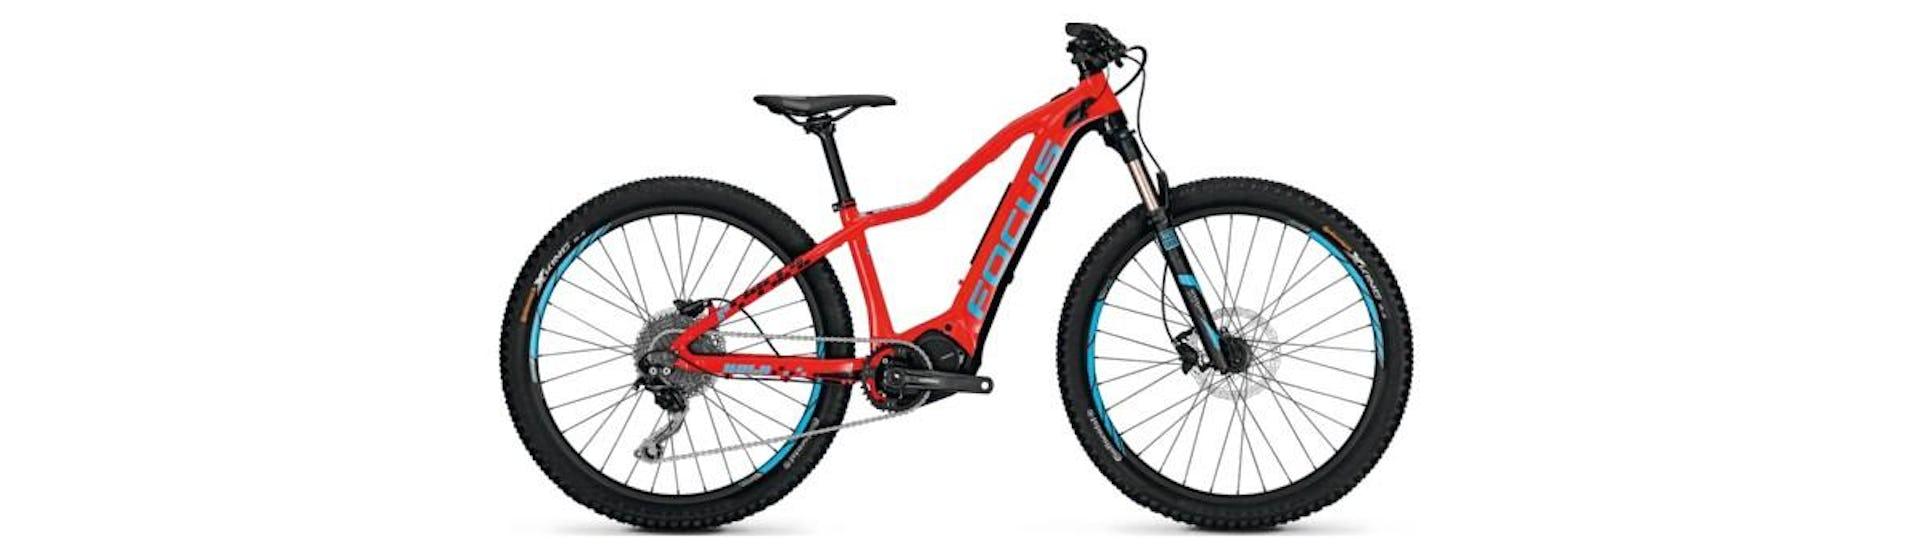 Rental - Mountain Bike for Adults